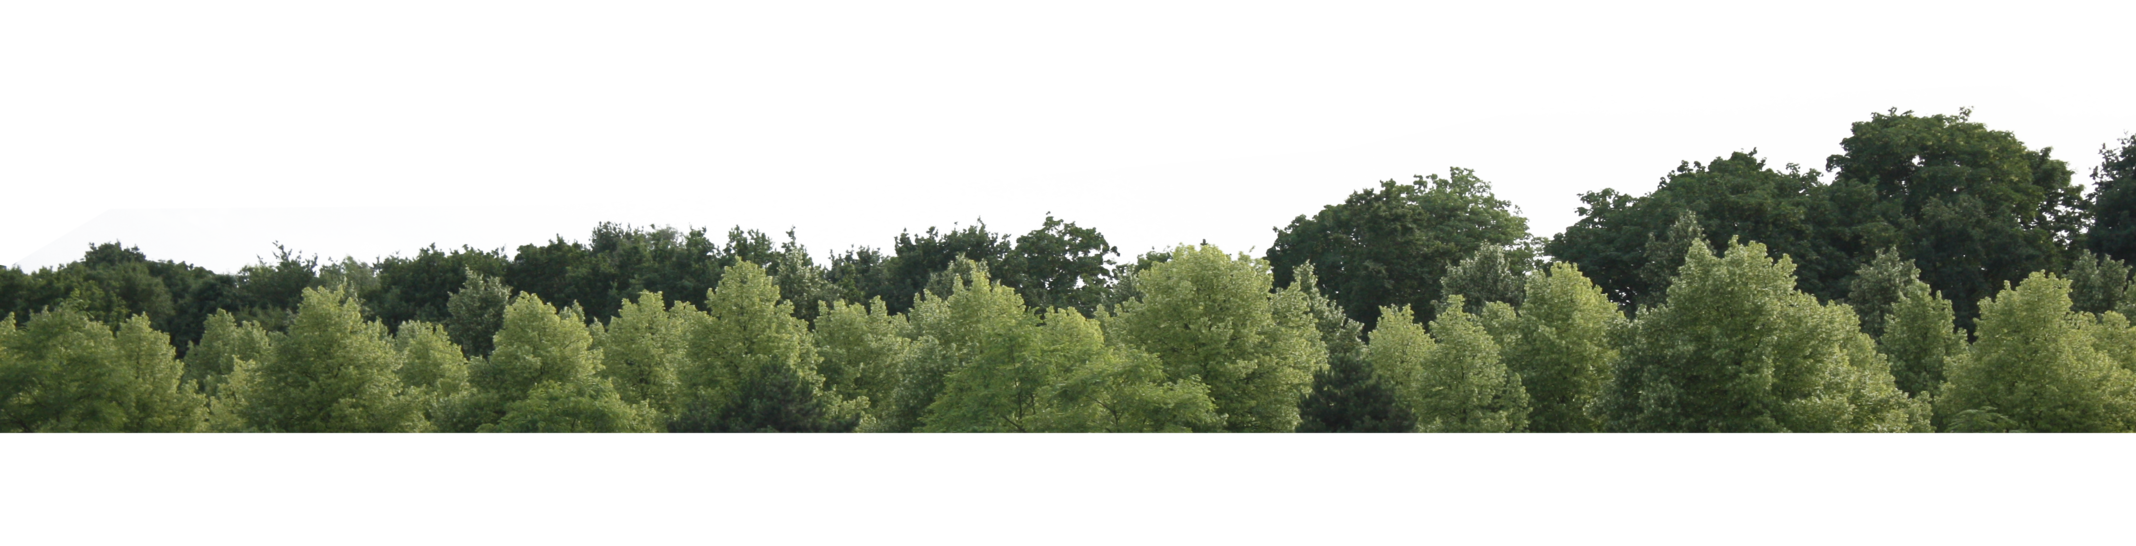 Tree Skyline Png Image Photoshop Backgrounds Image Skyline